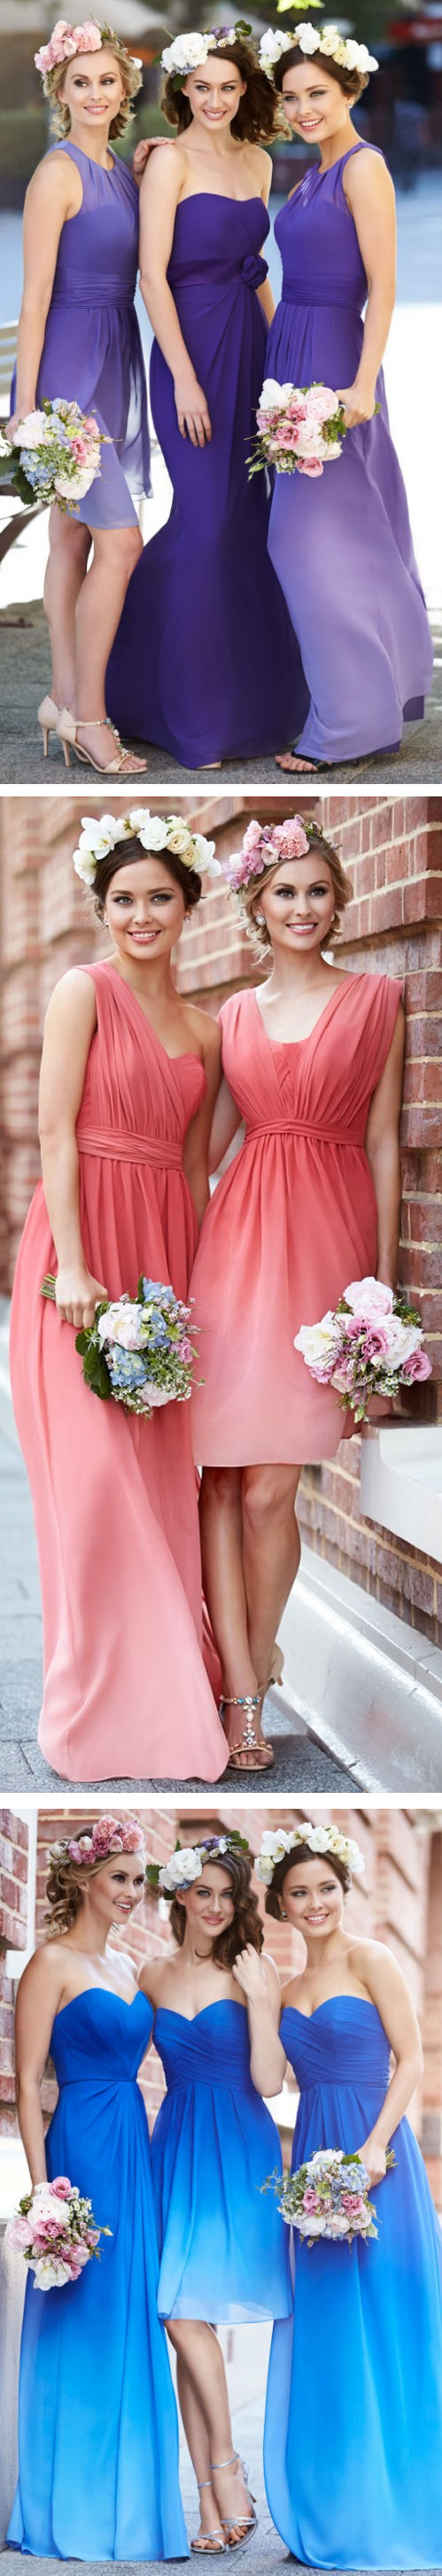 Ombre Bridesmaid Dresses ❤ #bridesmaid #wedding #dress ...